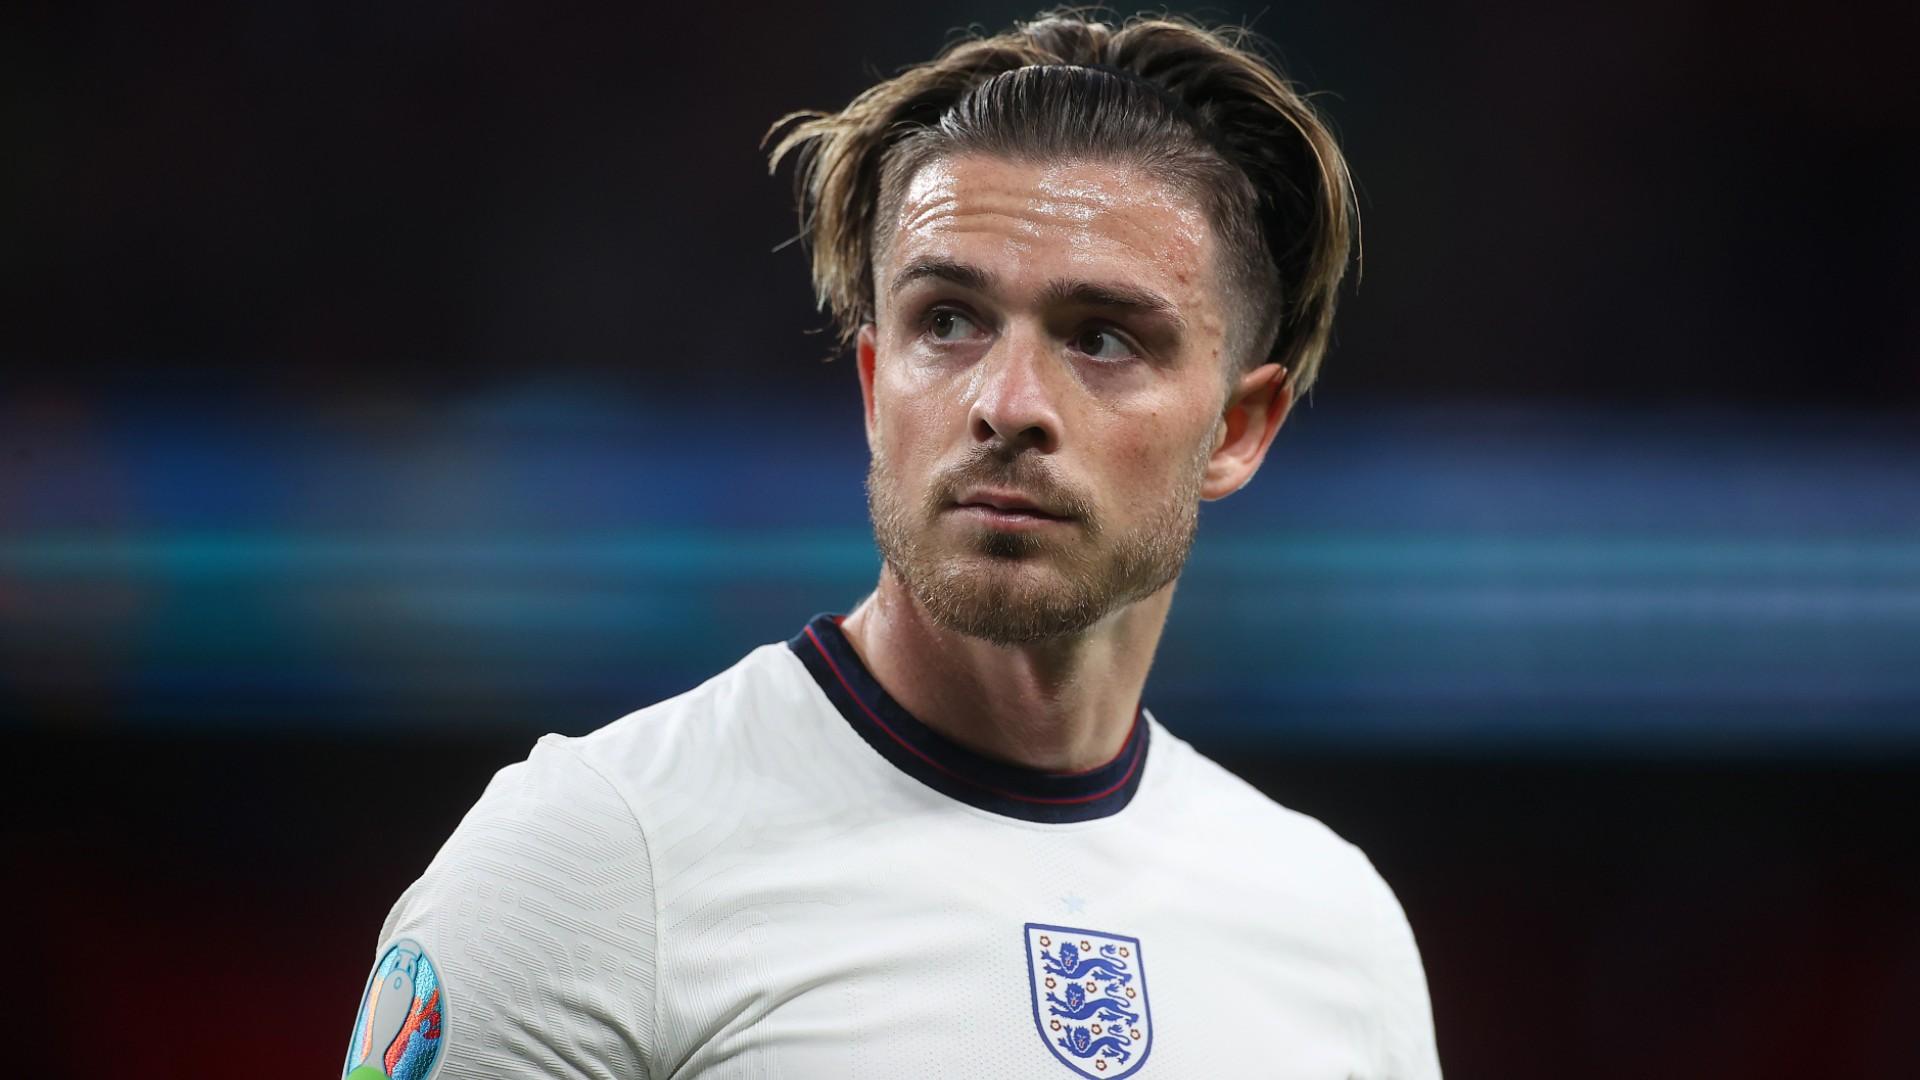 'No Grealish!' – Fans react to England team news as Sancho stars and Aston Villa benched